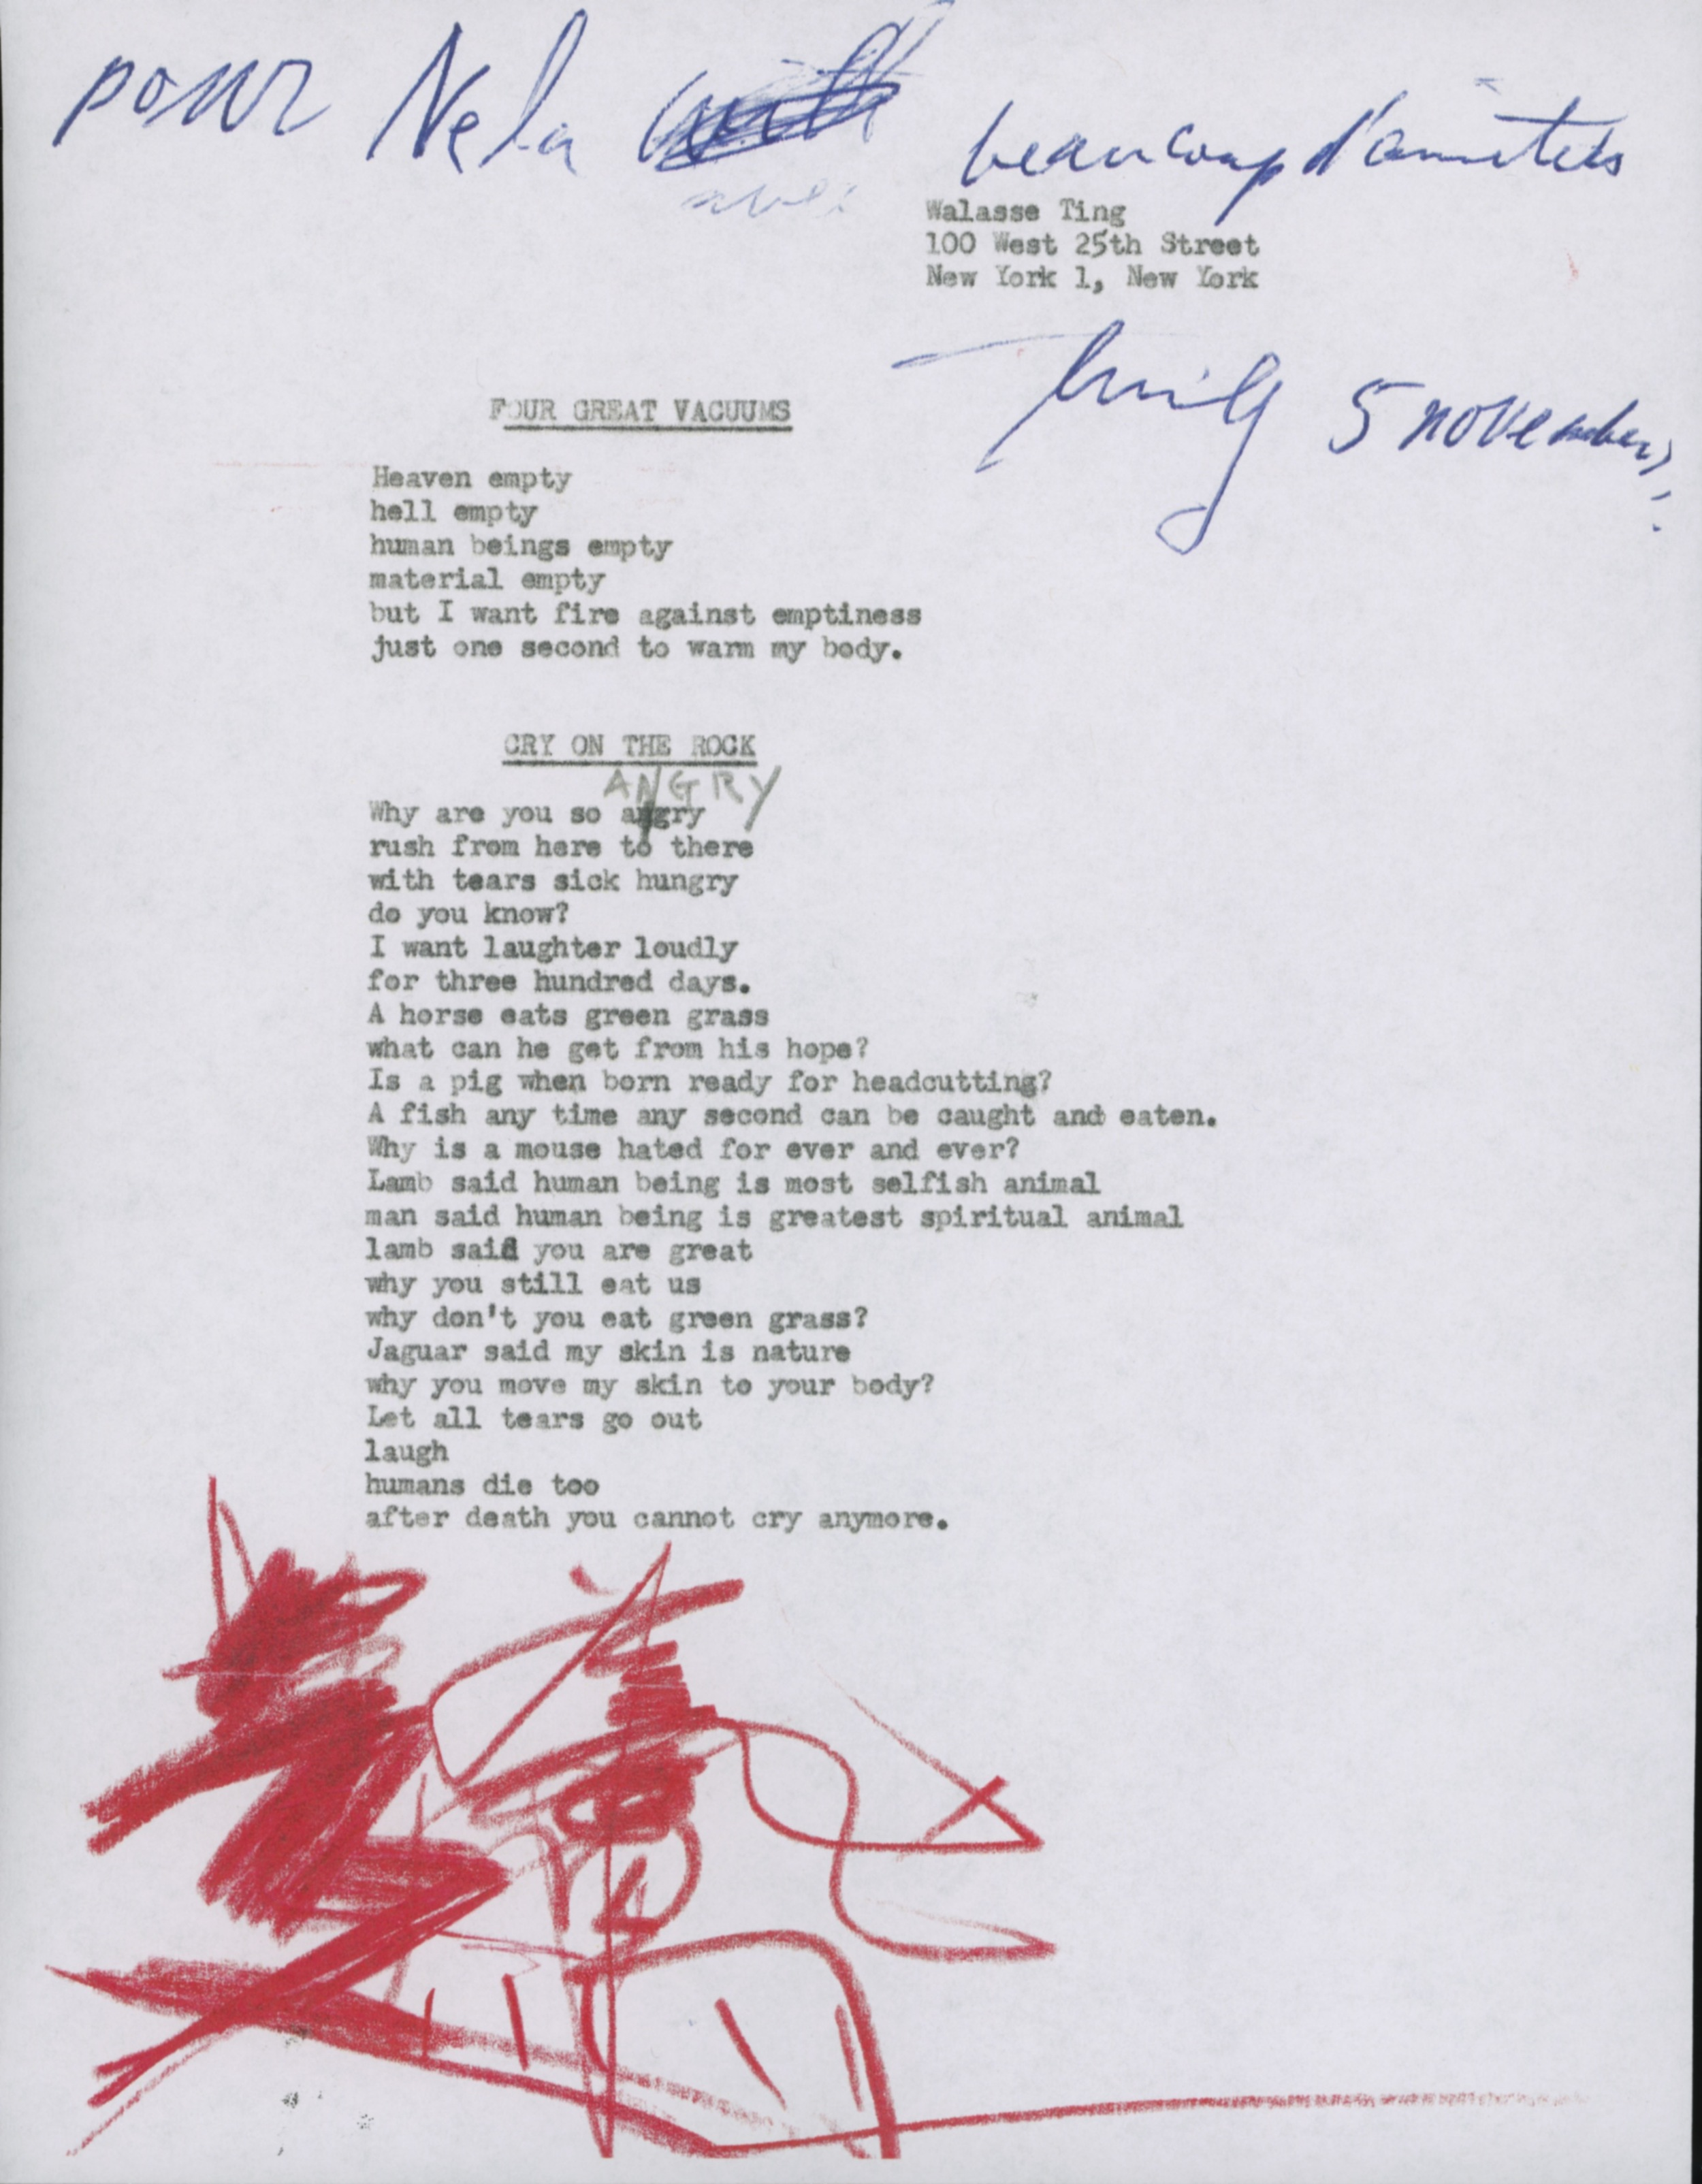 Walasse Ting Poem to Nela Arias